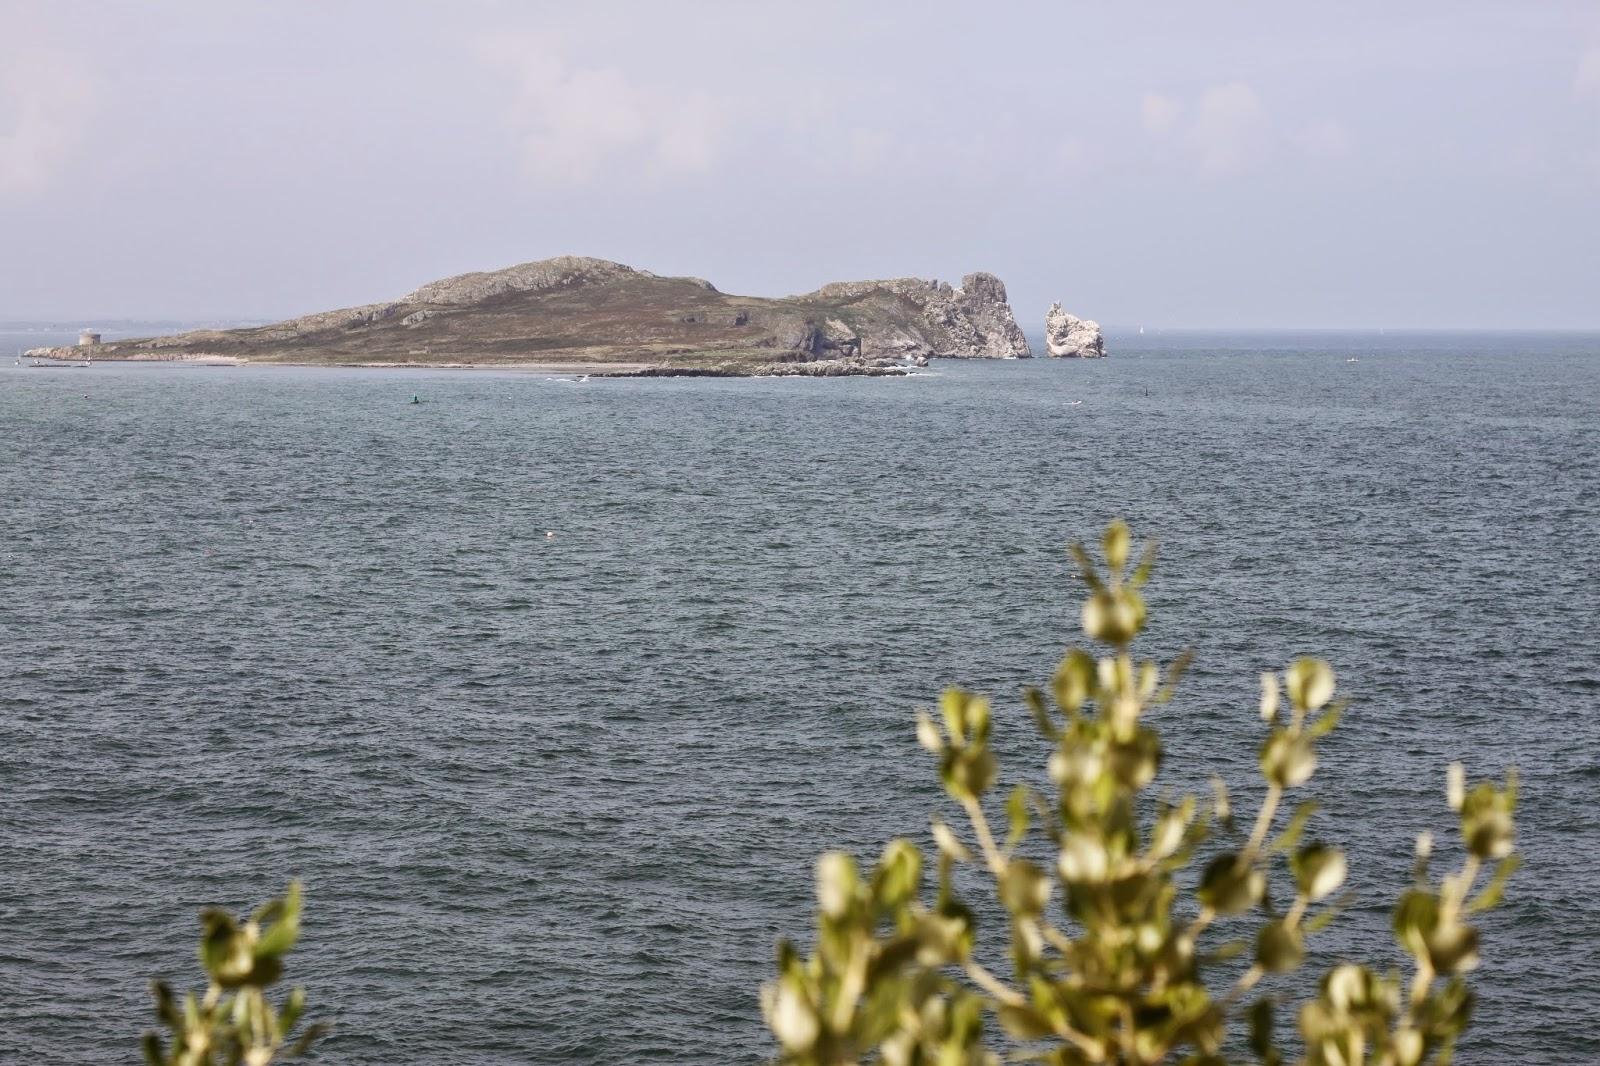 howth co Dublin, Ireland views of the sea